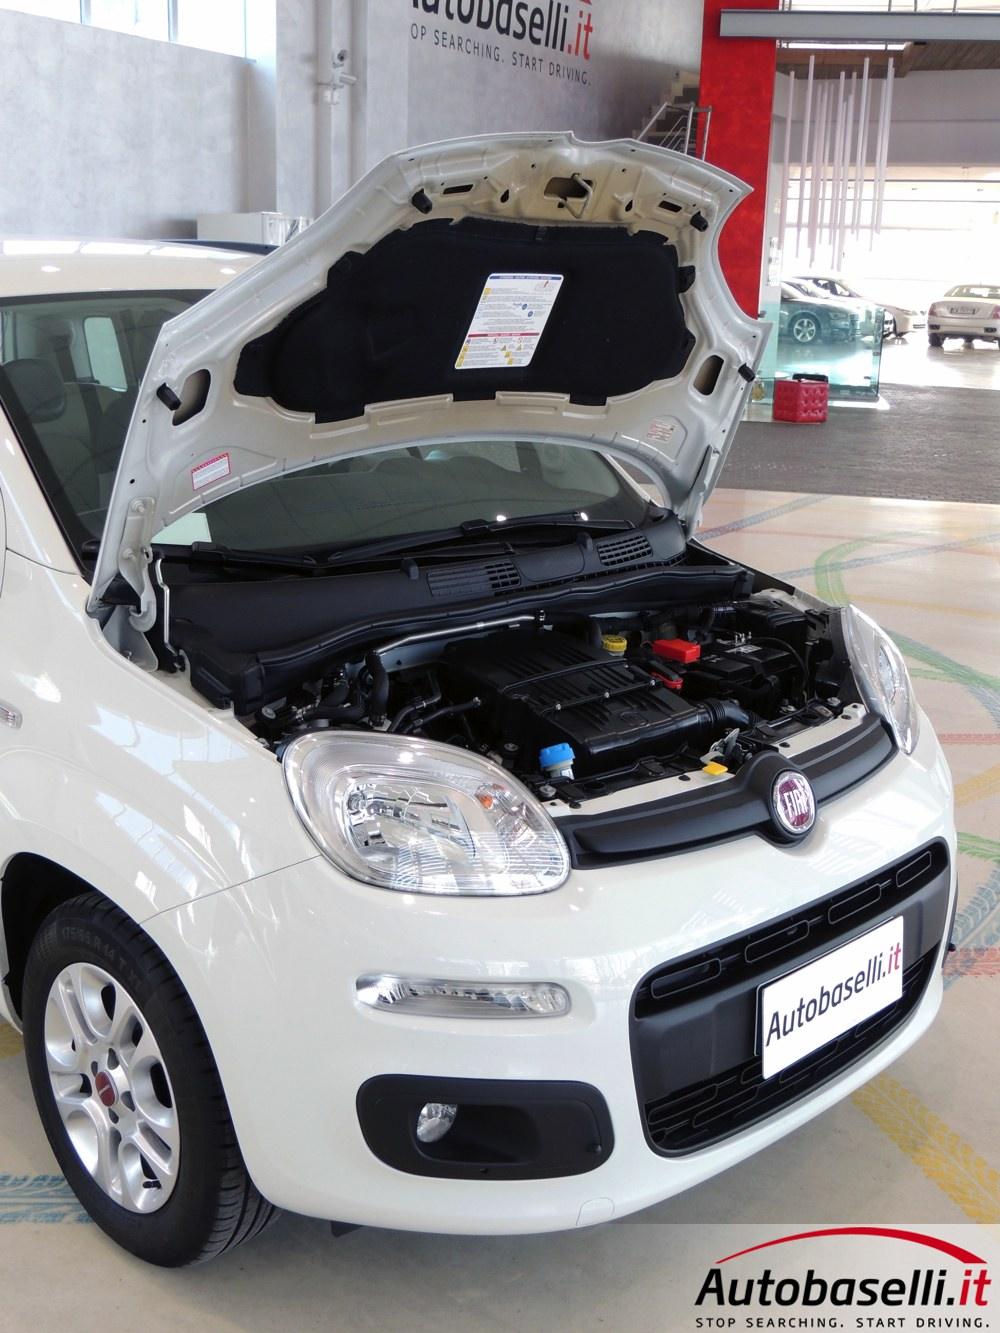 Ray Ban Caravan Uk Ebay Motors « Heritage Malta